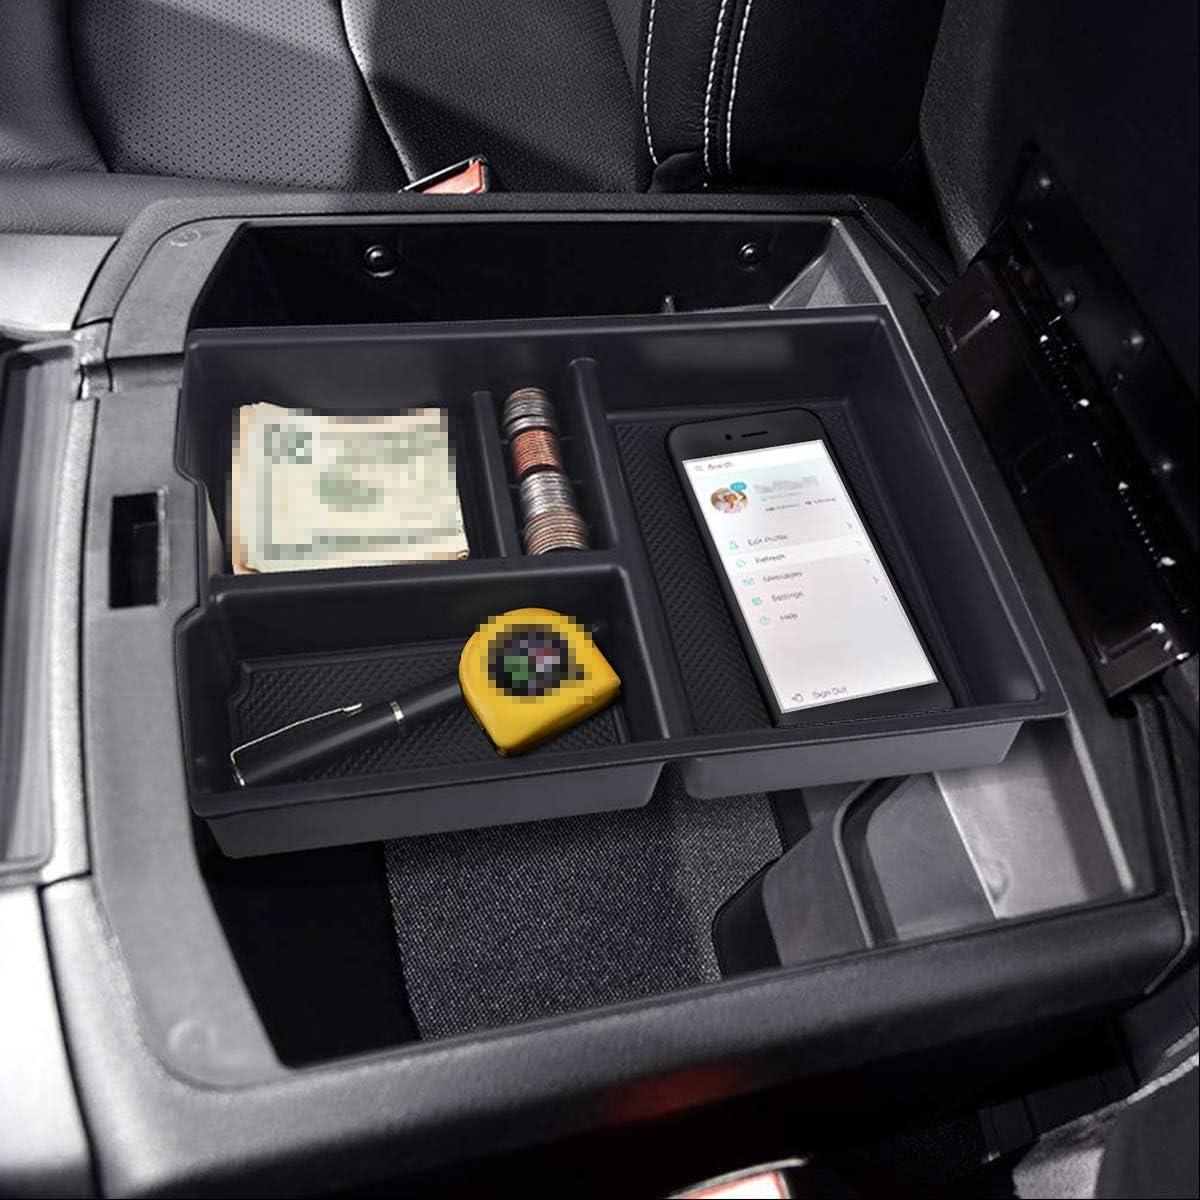 Fit f/ür Dodge Ram 1500 2009-2018 LUVCARPB Auto Organizer Mittelarmlehne Vorratsbeh/älter Halter Tray Box Zubeh/ör Car Styling